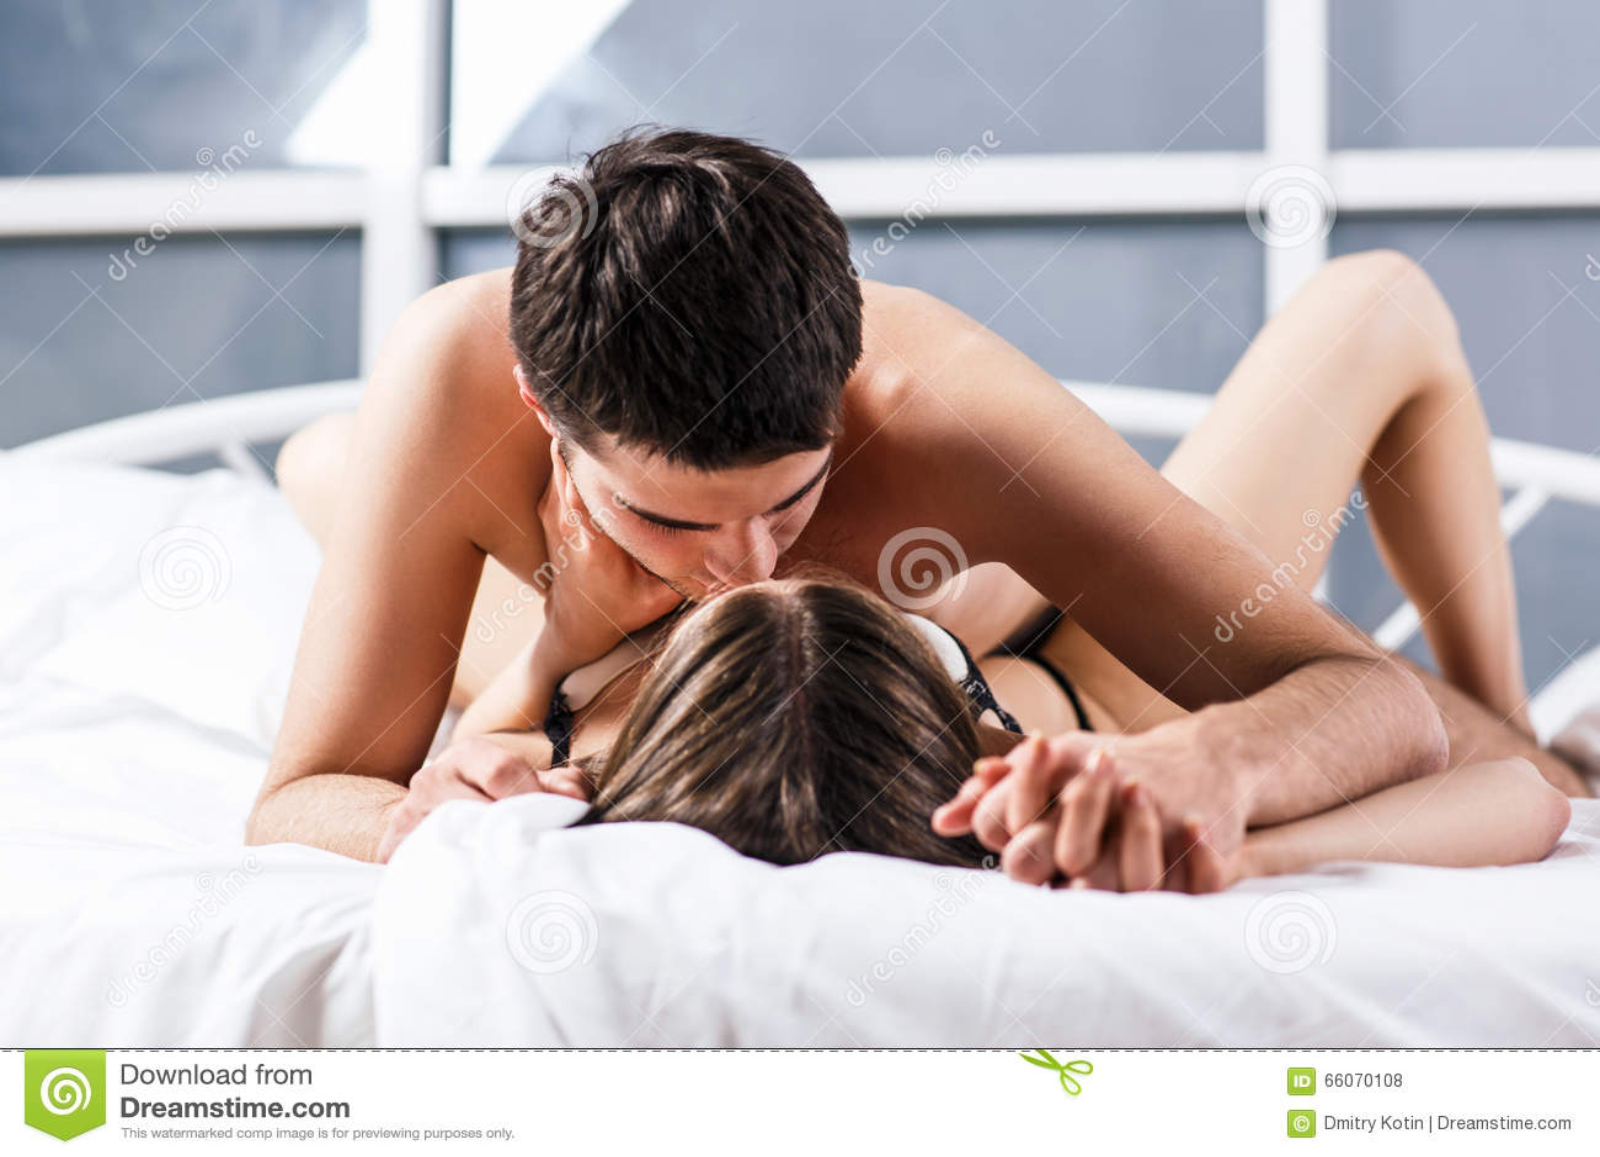 Sex romantic couple kissing